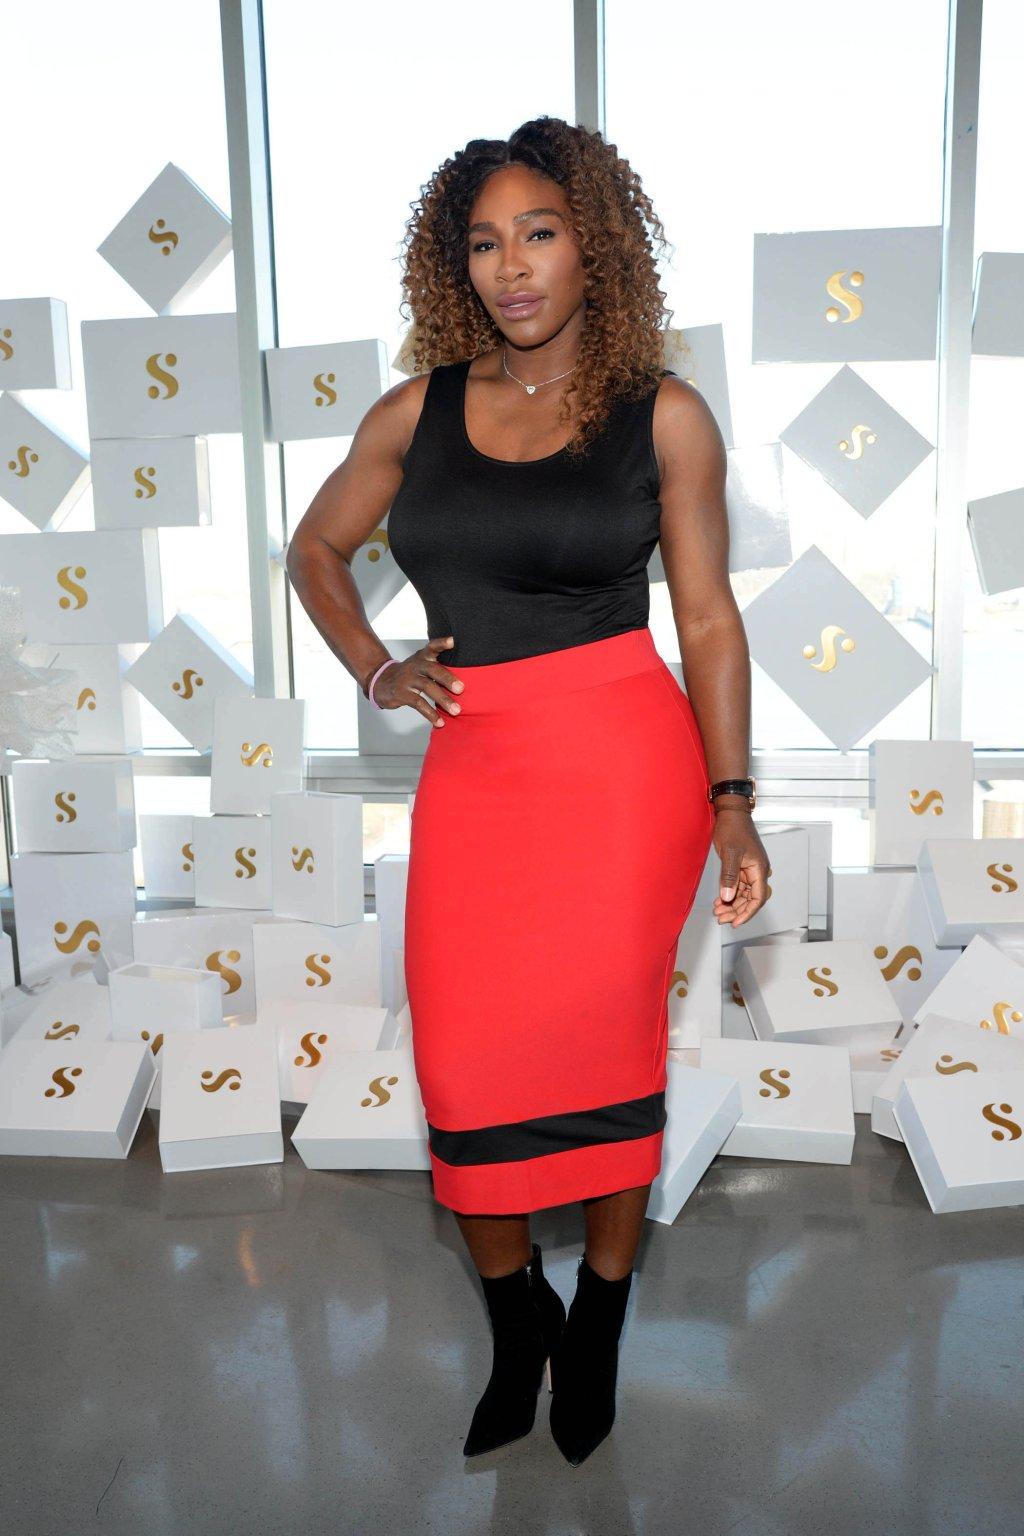 Serena Williams Clothing Line 'Serena'